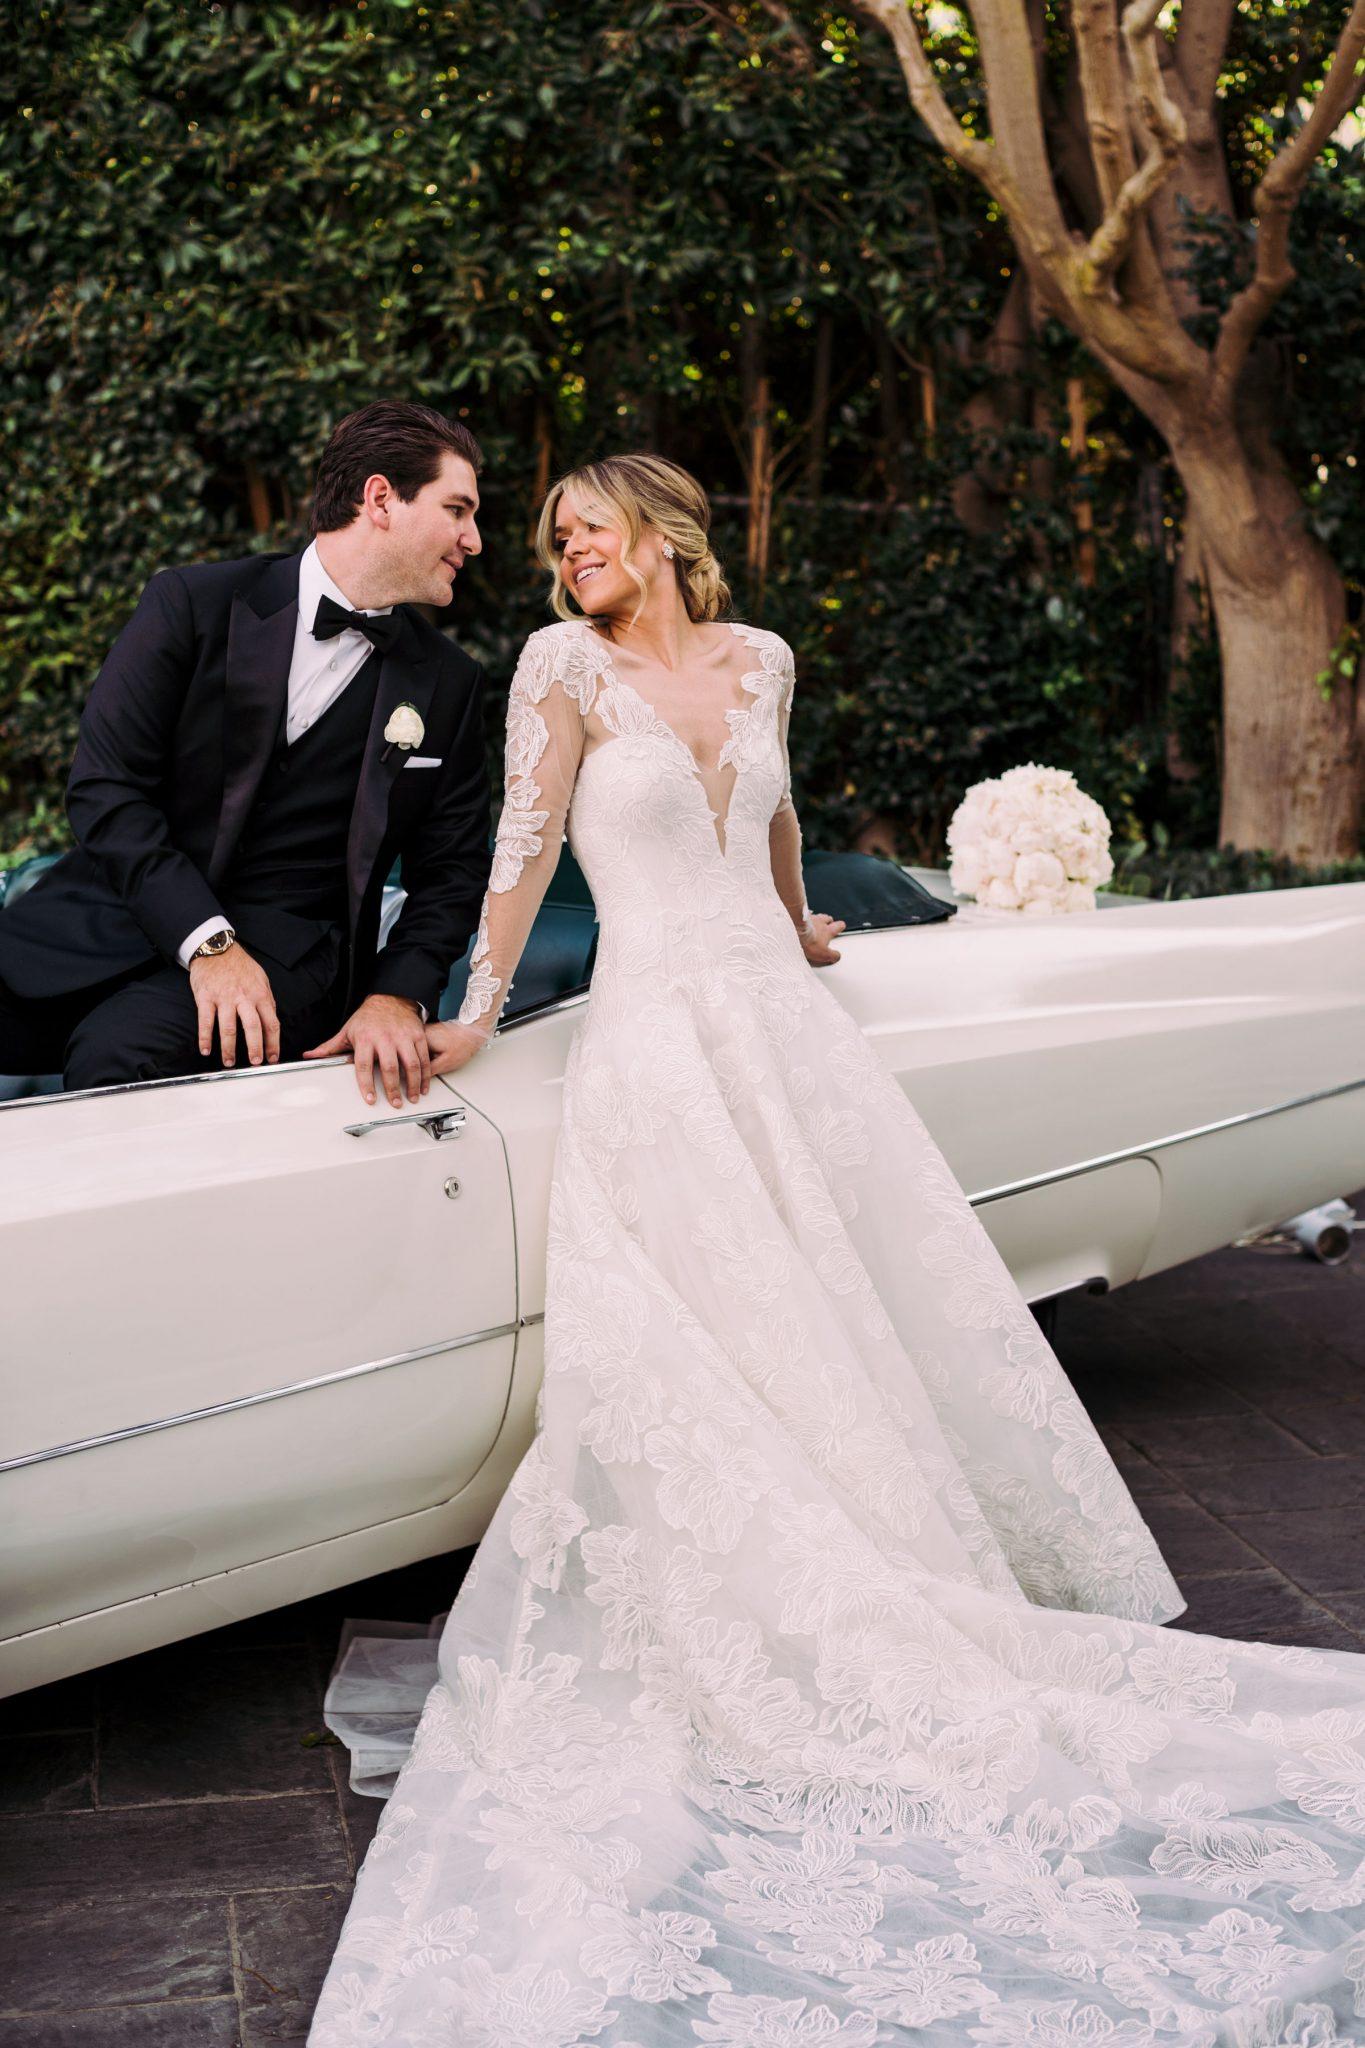 ashley-maxx-beverly-hills-wedding-150